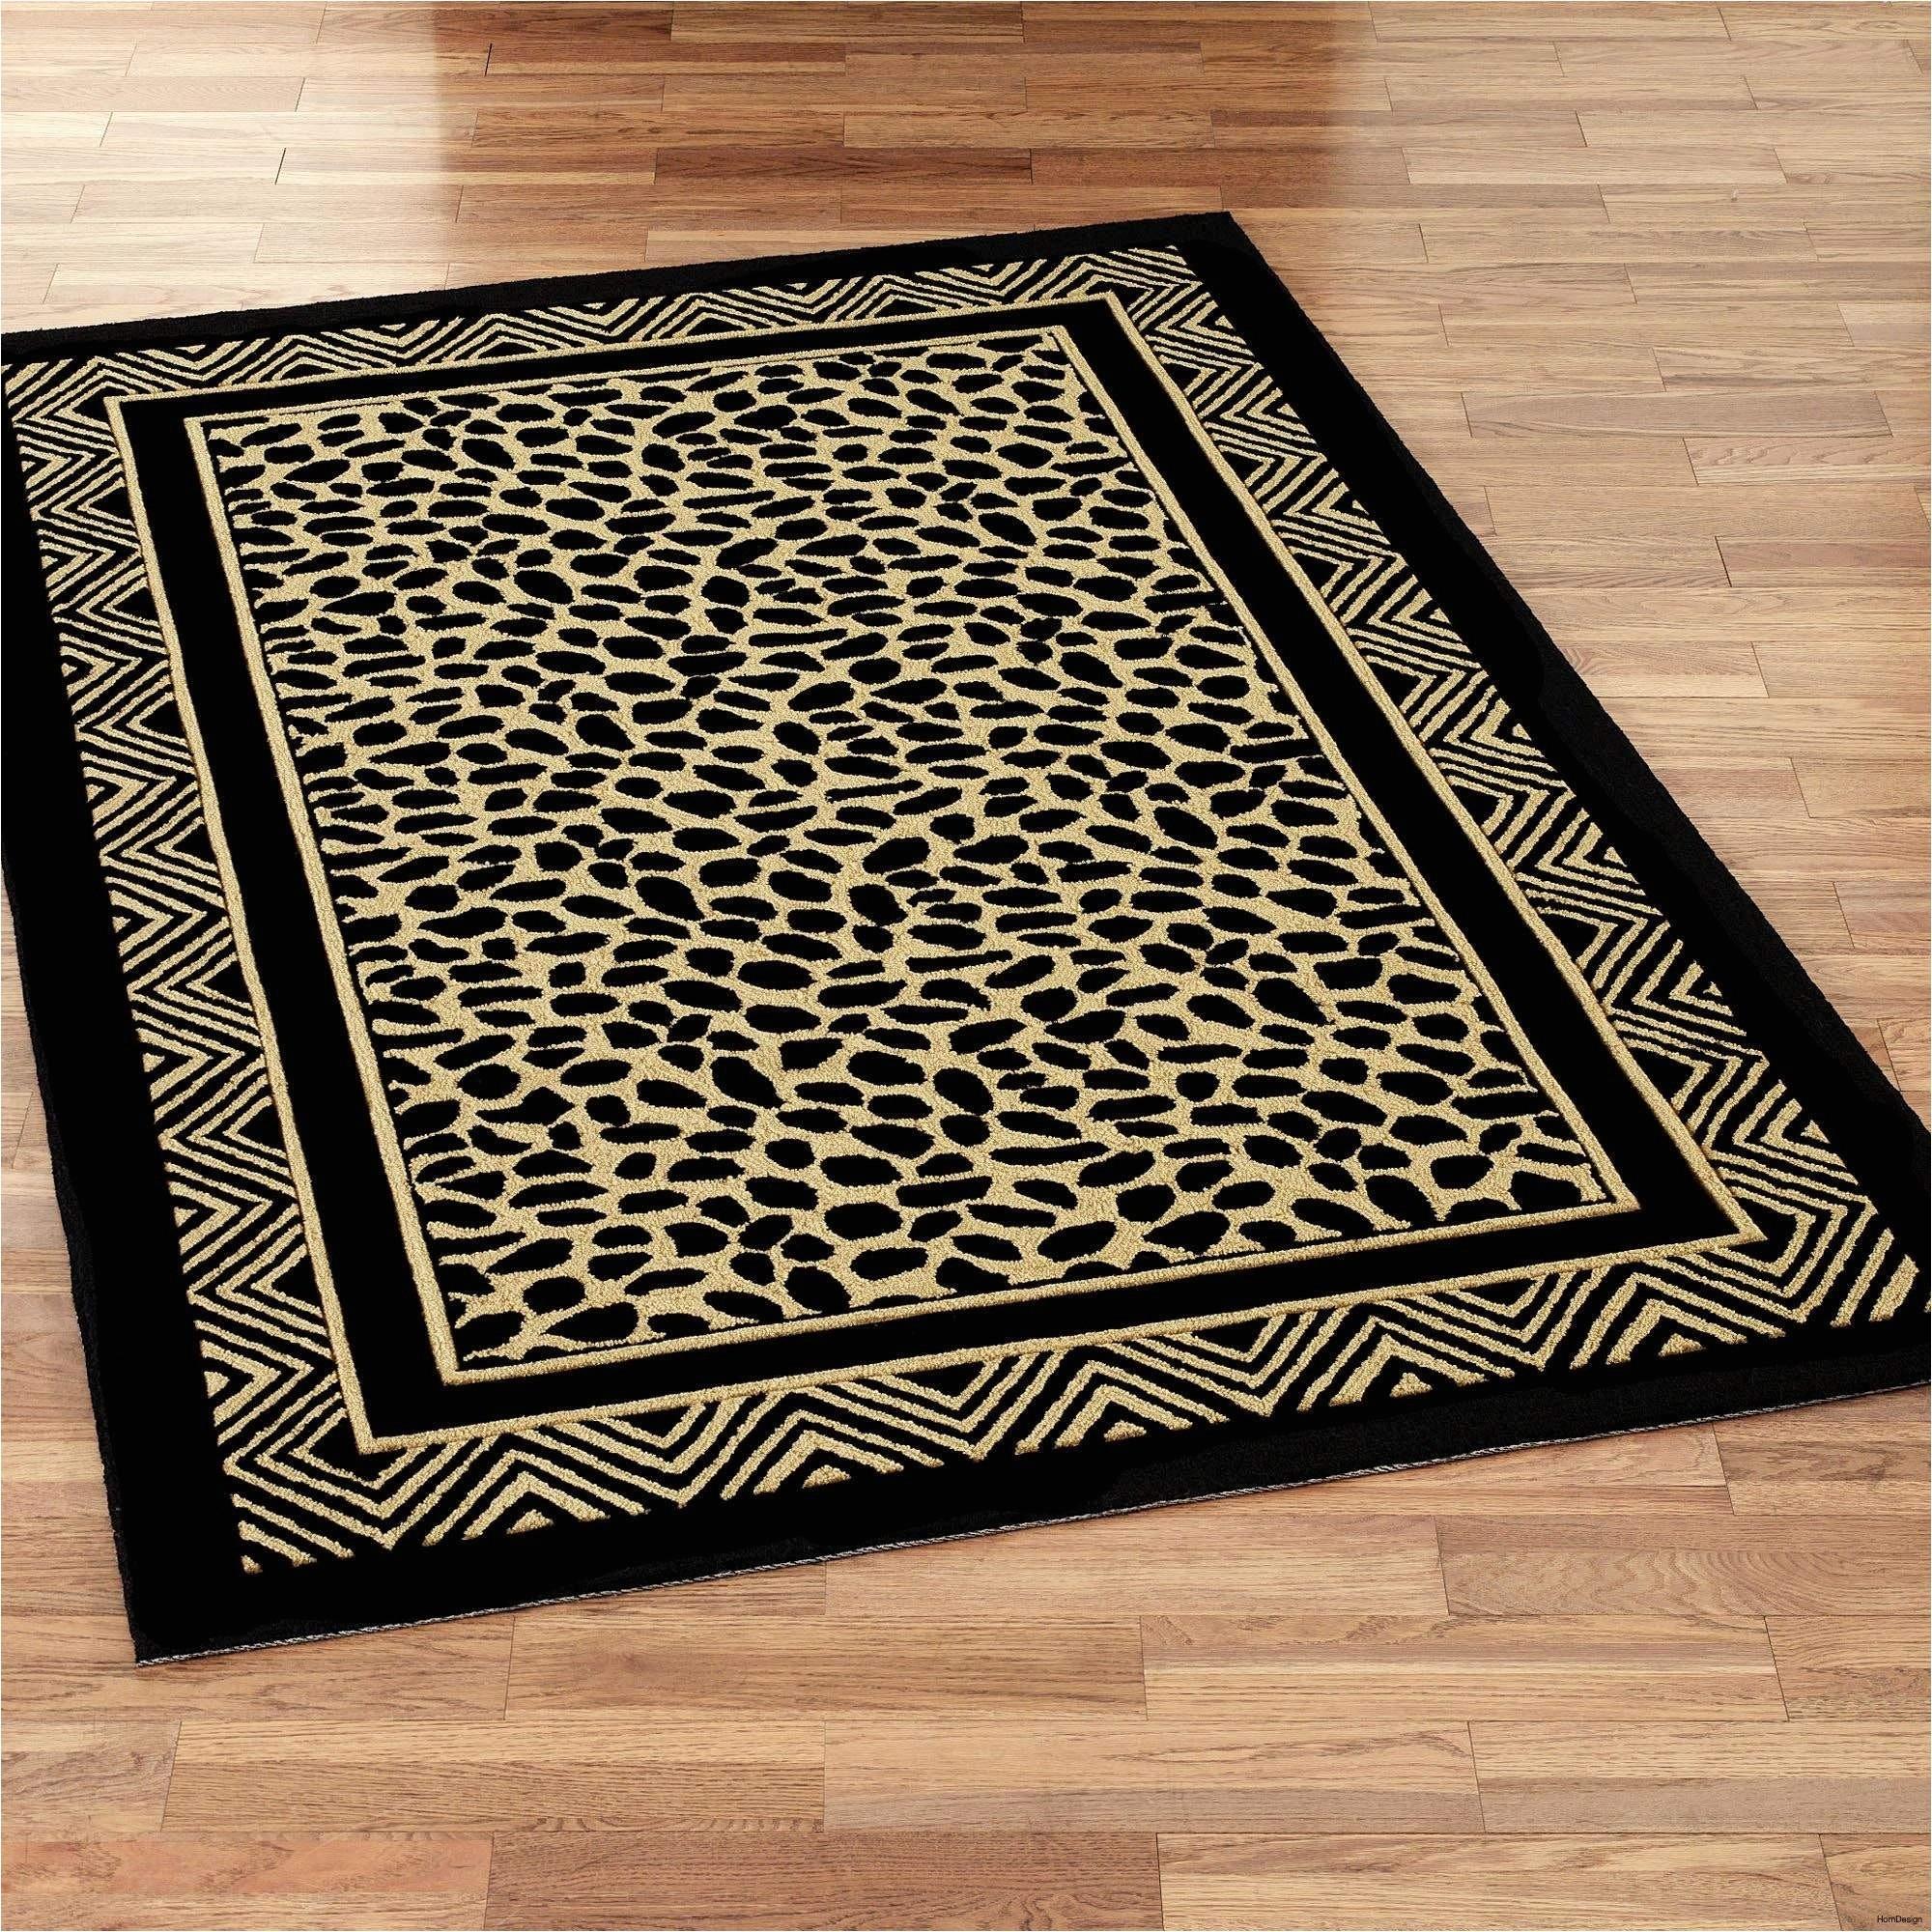 empire carpet hardwood flooring of 35 elegant modern pattern carpet pictures flooring design ideas throughout modern pattern carpet inspirational navy blue and white area rugs photograph of 35 elegant modern pattern